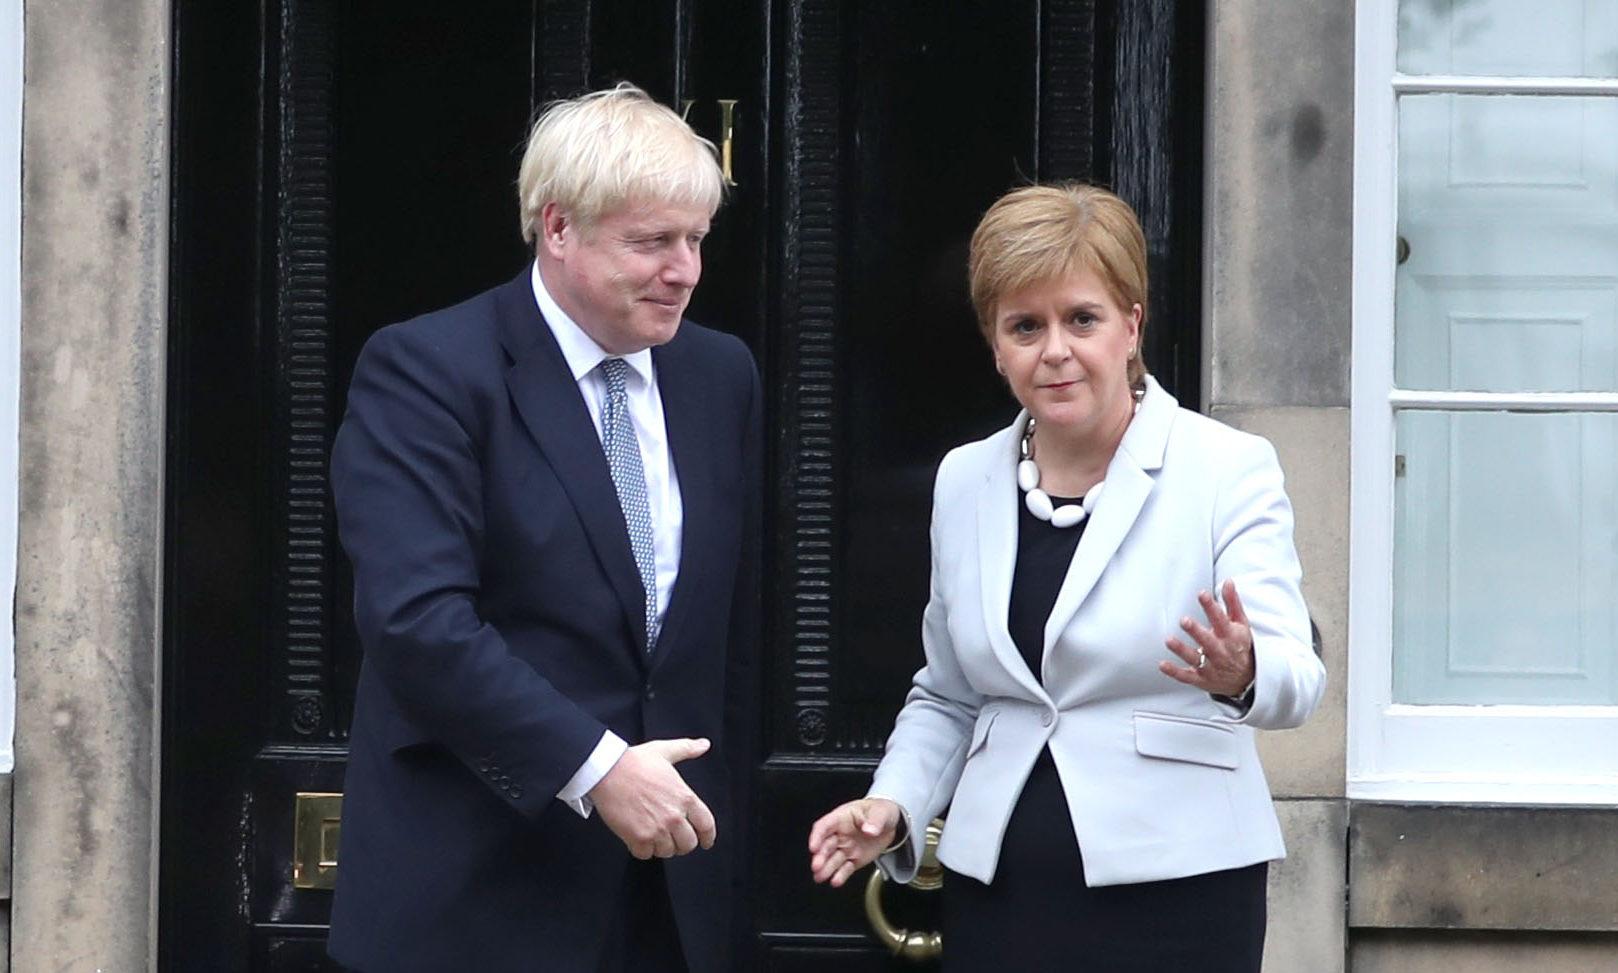 Boris Johnson and Nicola Sturgeon outside Bute House in Edinburgh.